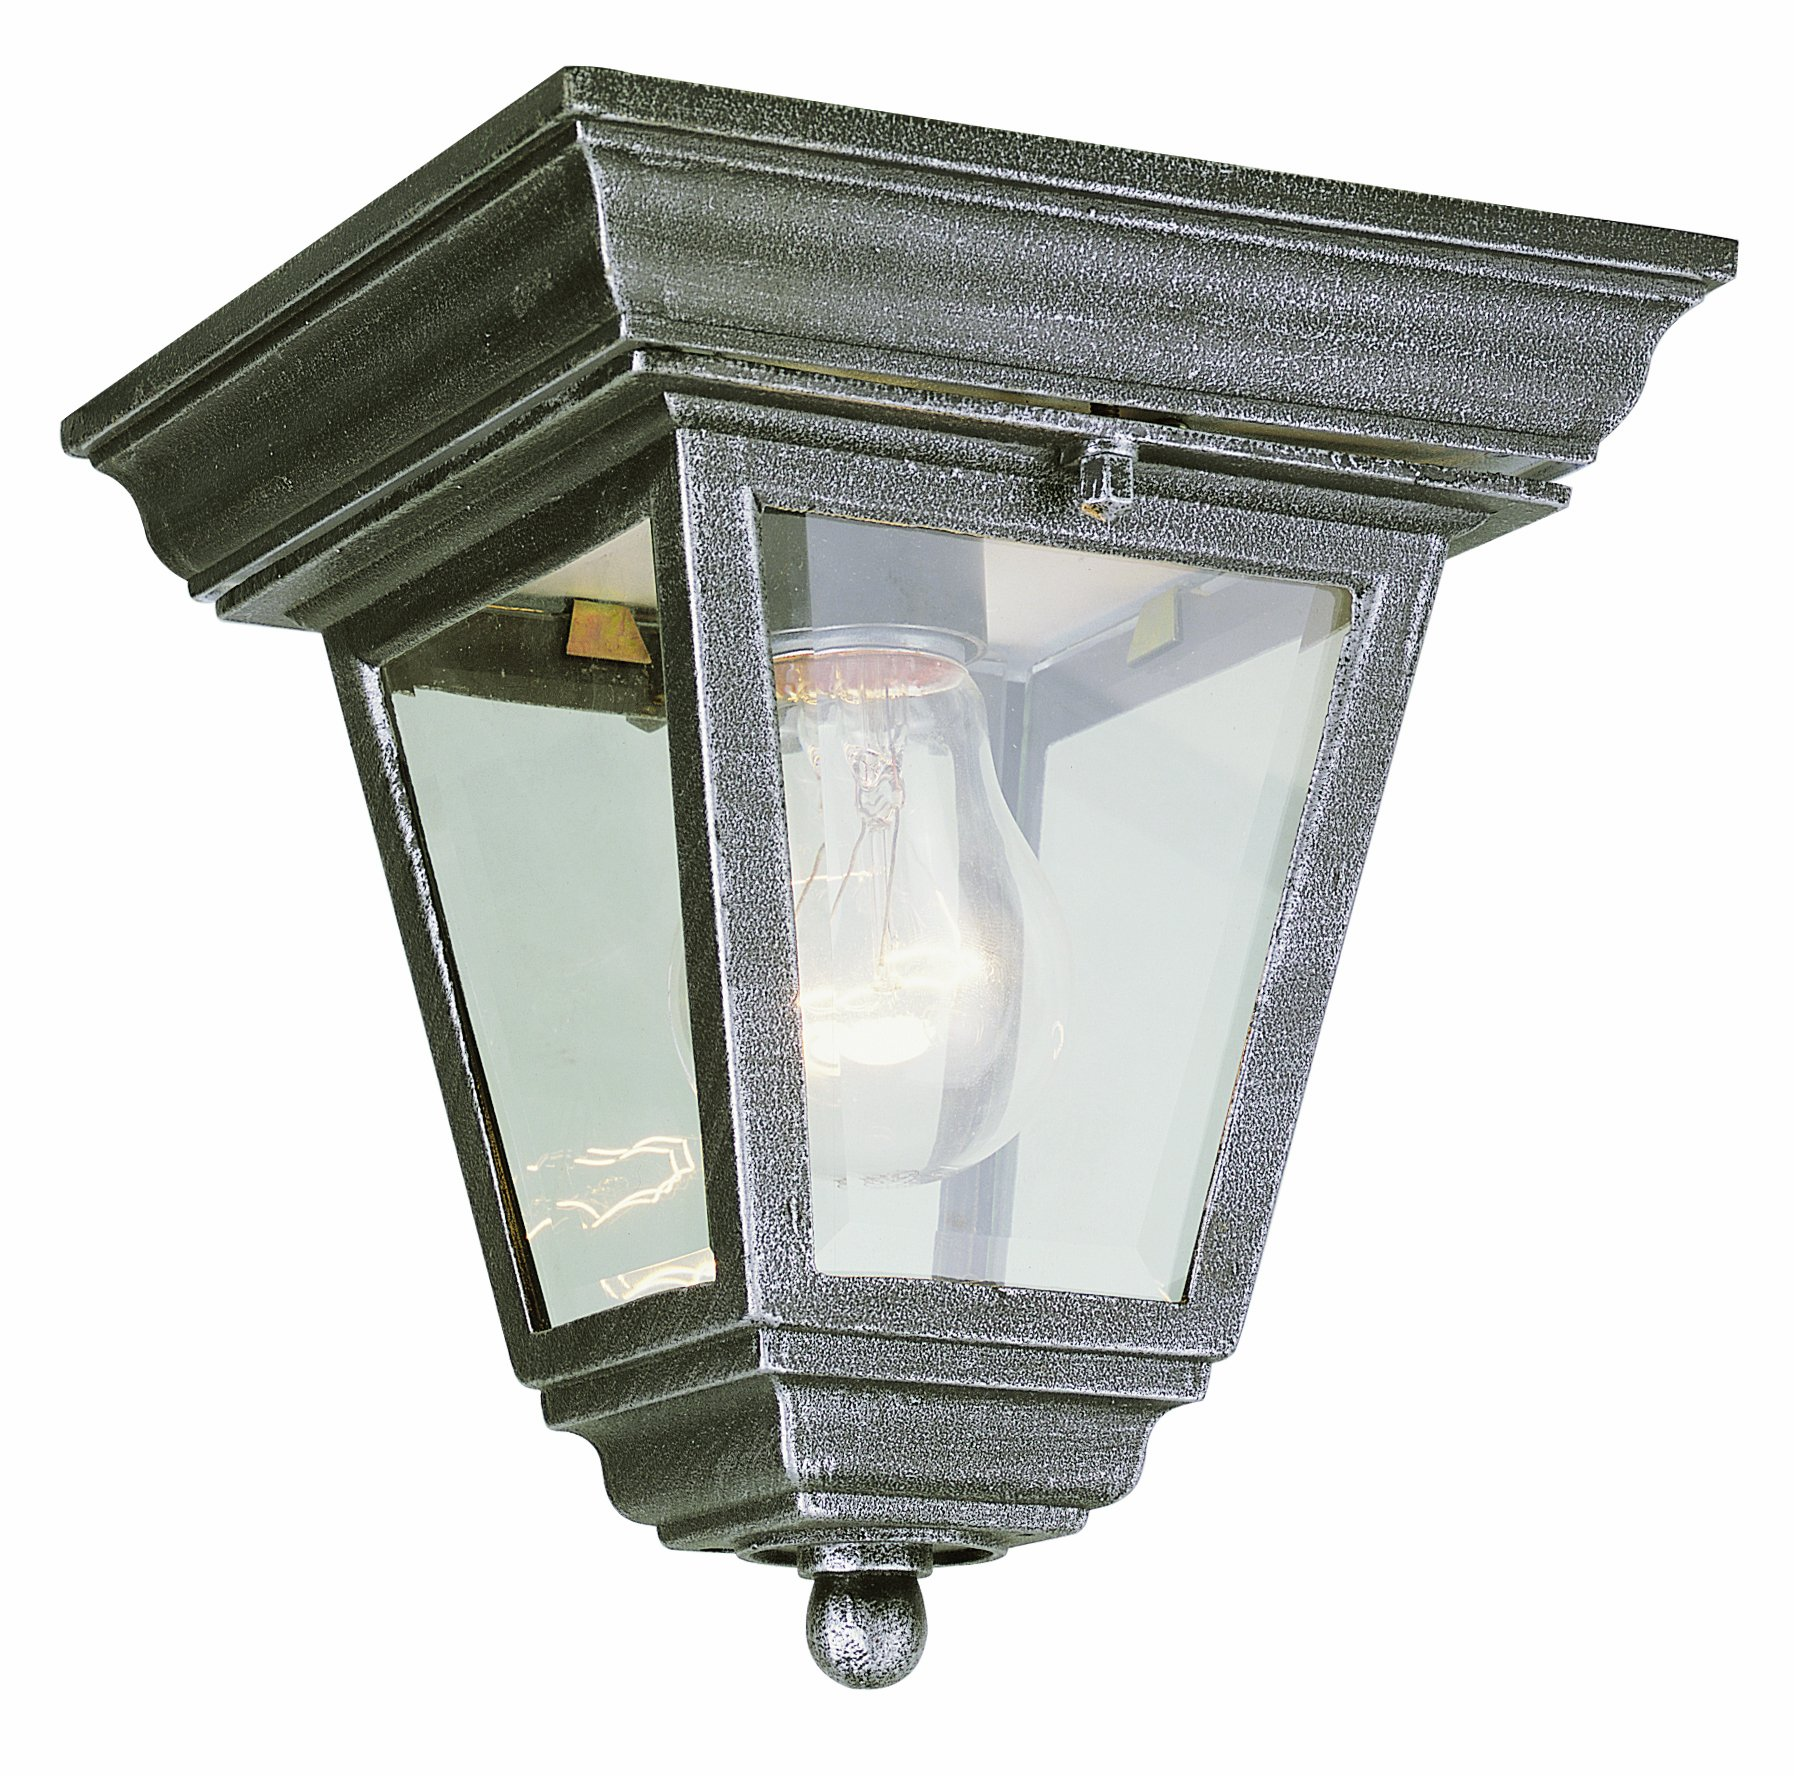 Trans Globe Lighting 4903 RT Outdoor Robertson 7.25'' Flushmount Lantern, Rust